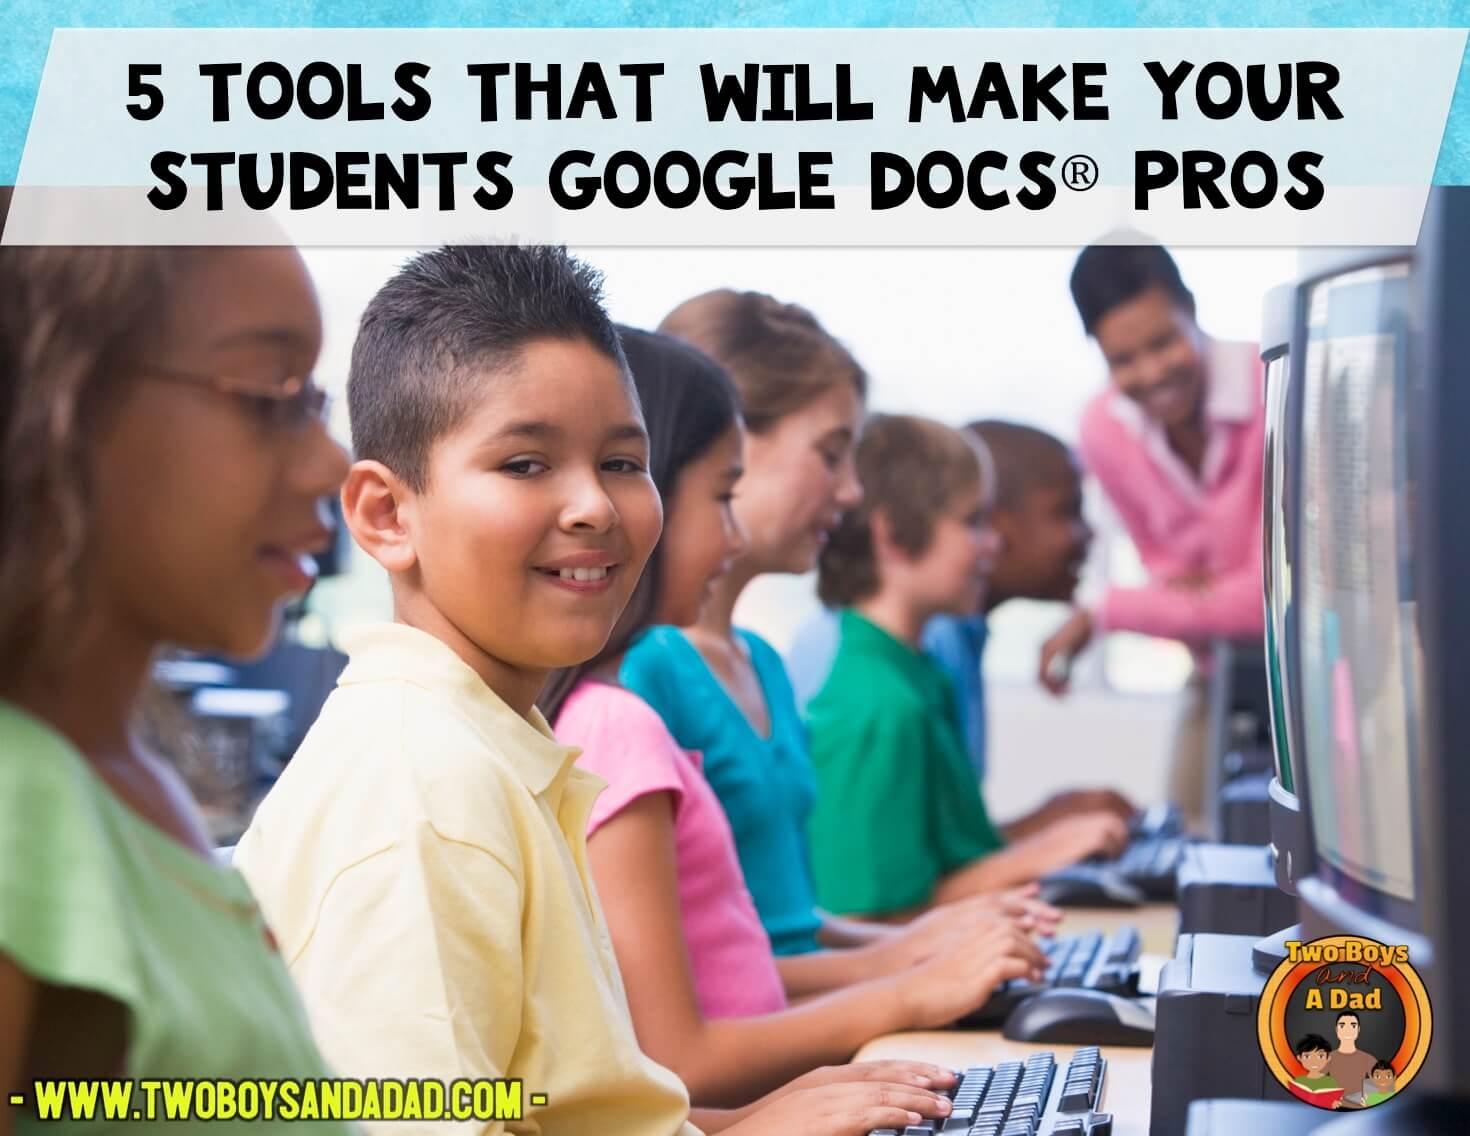 Using Google Docs Tools as a Pro